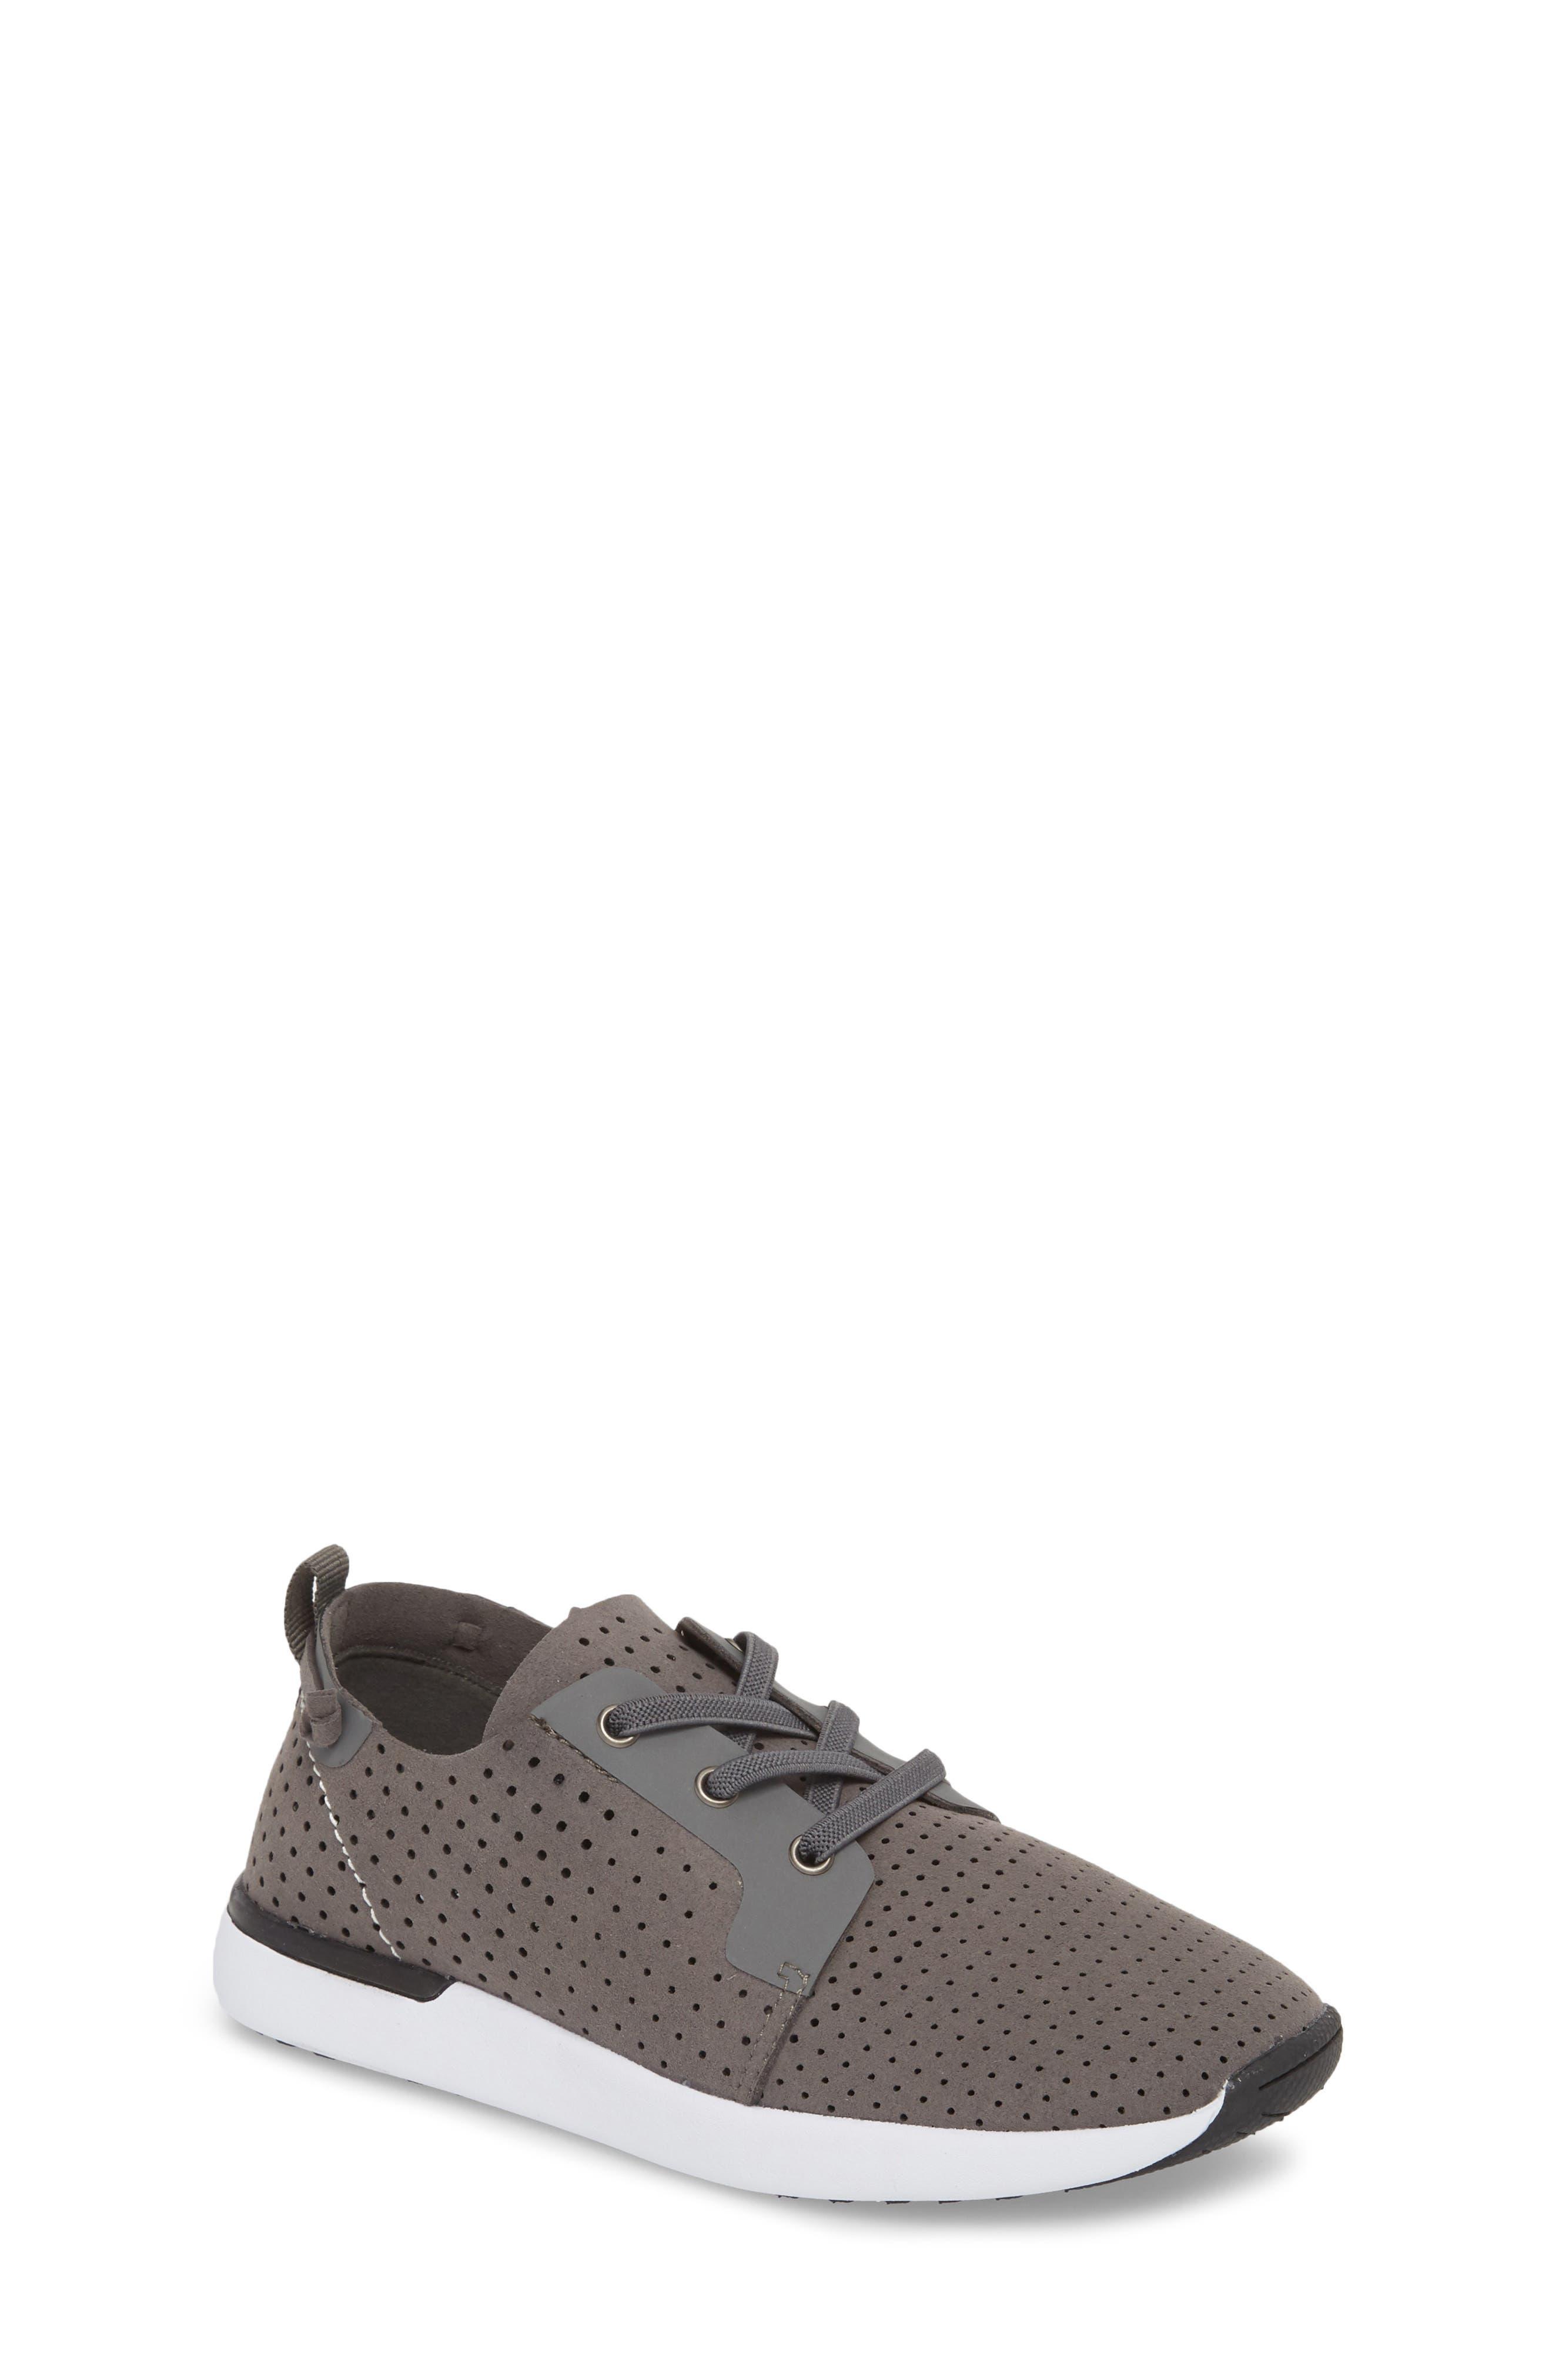 Brixxon Perforated Sneaker,                         Main,                         color, Grey